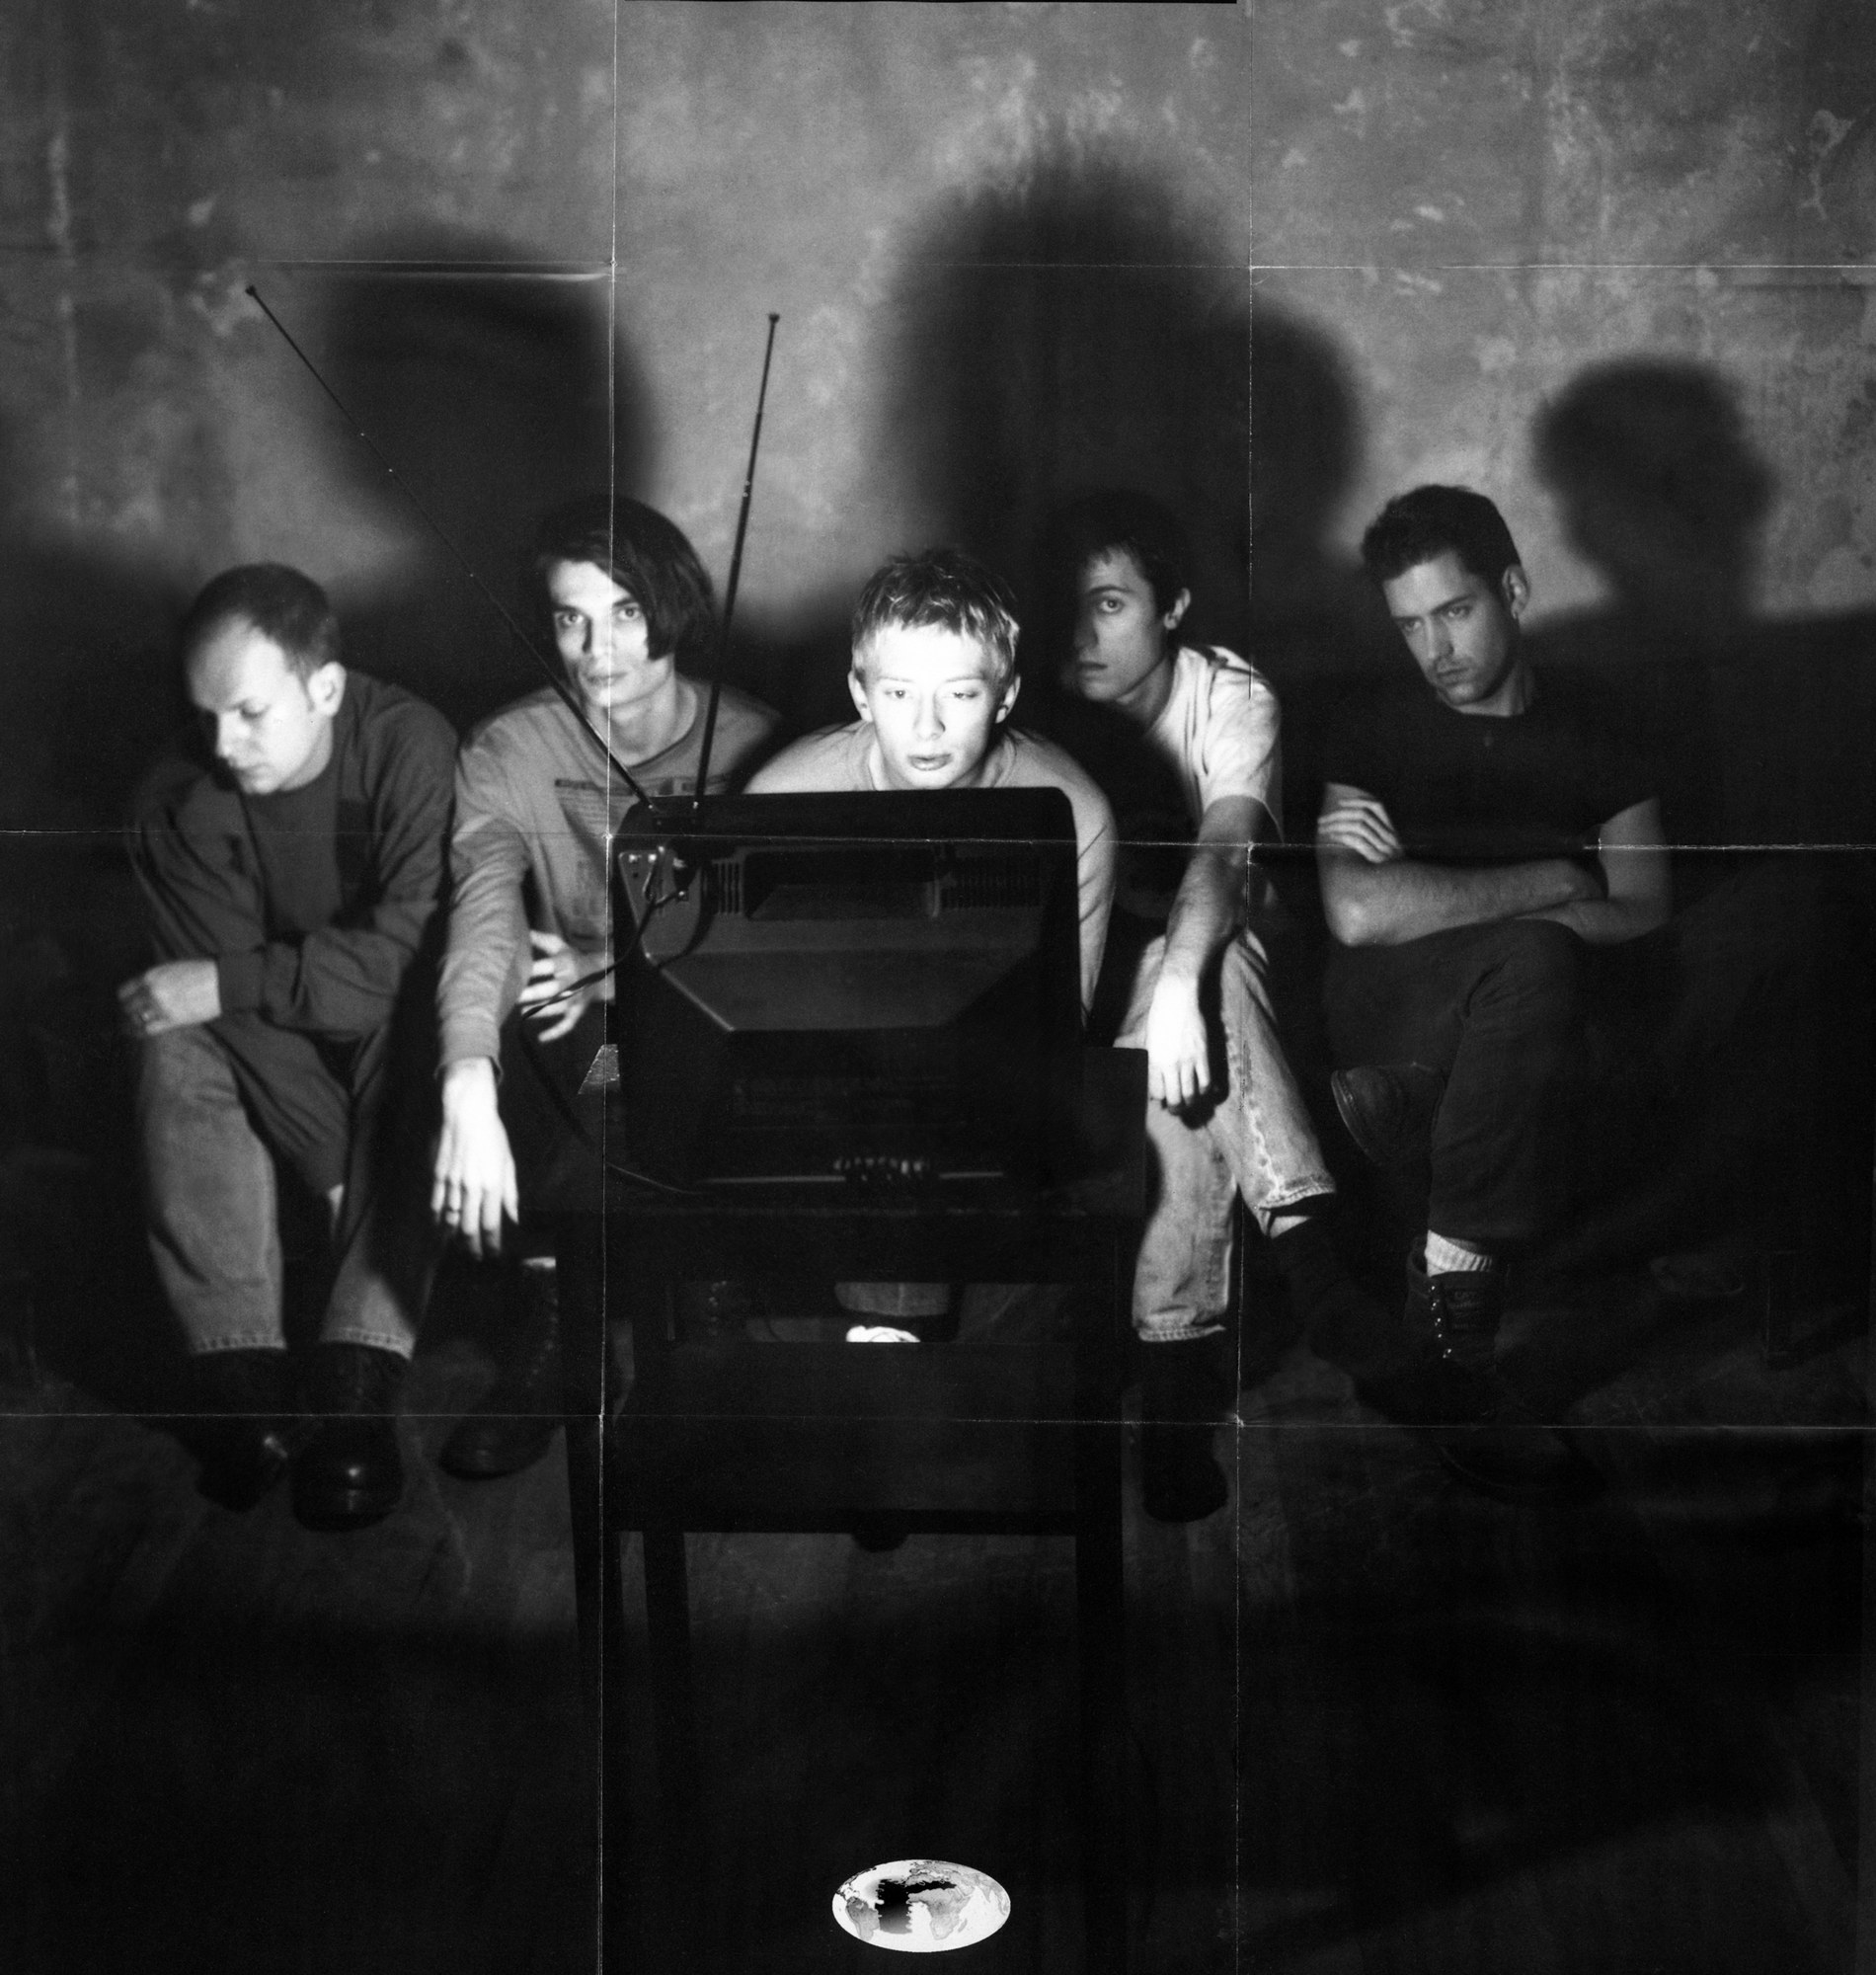 radiohead orgie pron hun